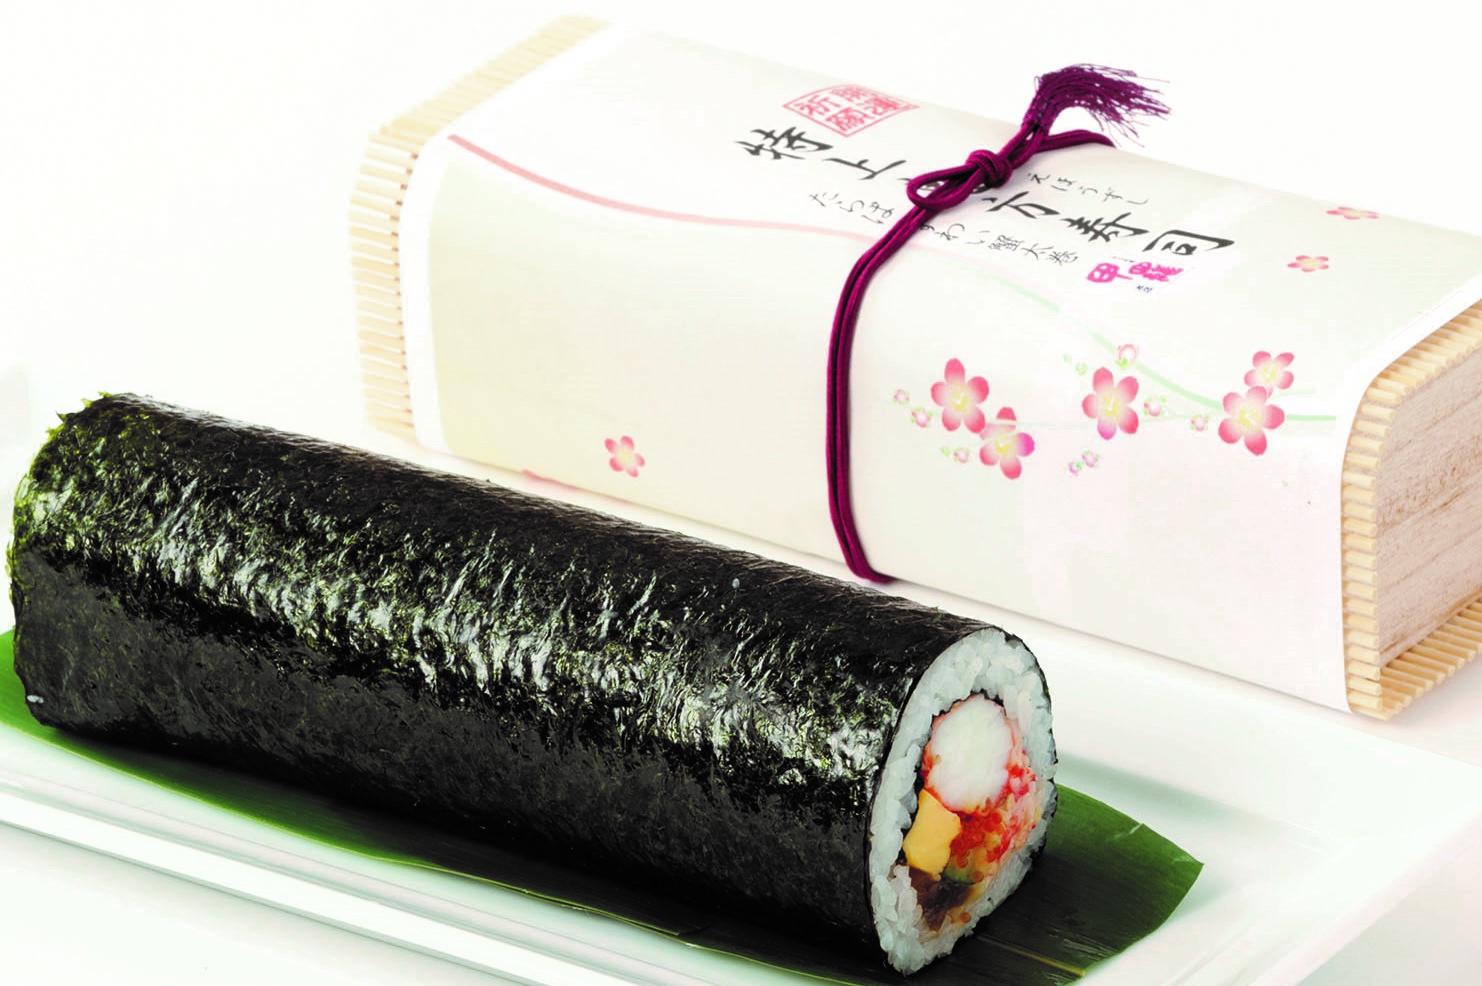 特上恵方寿司(1月28日まで予約可能)